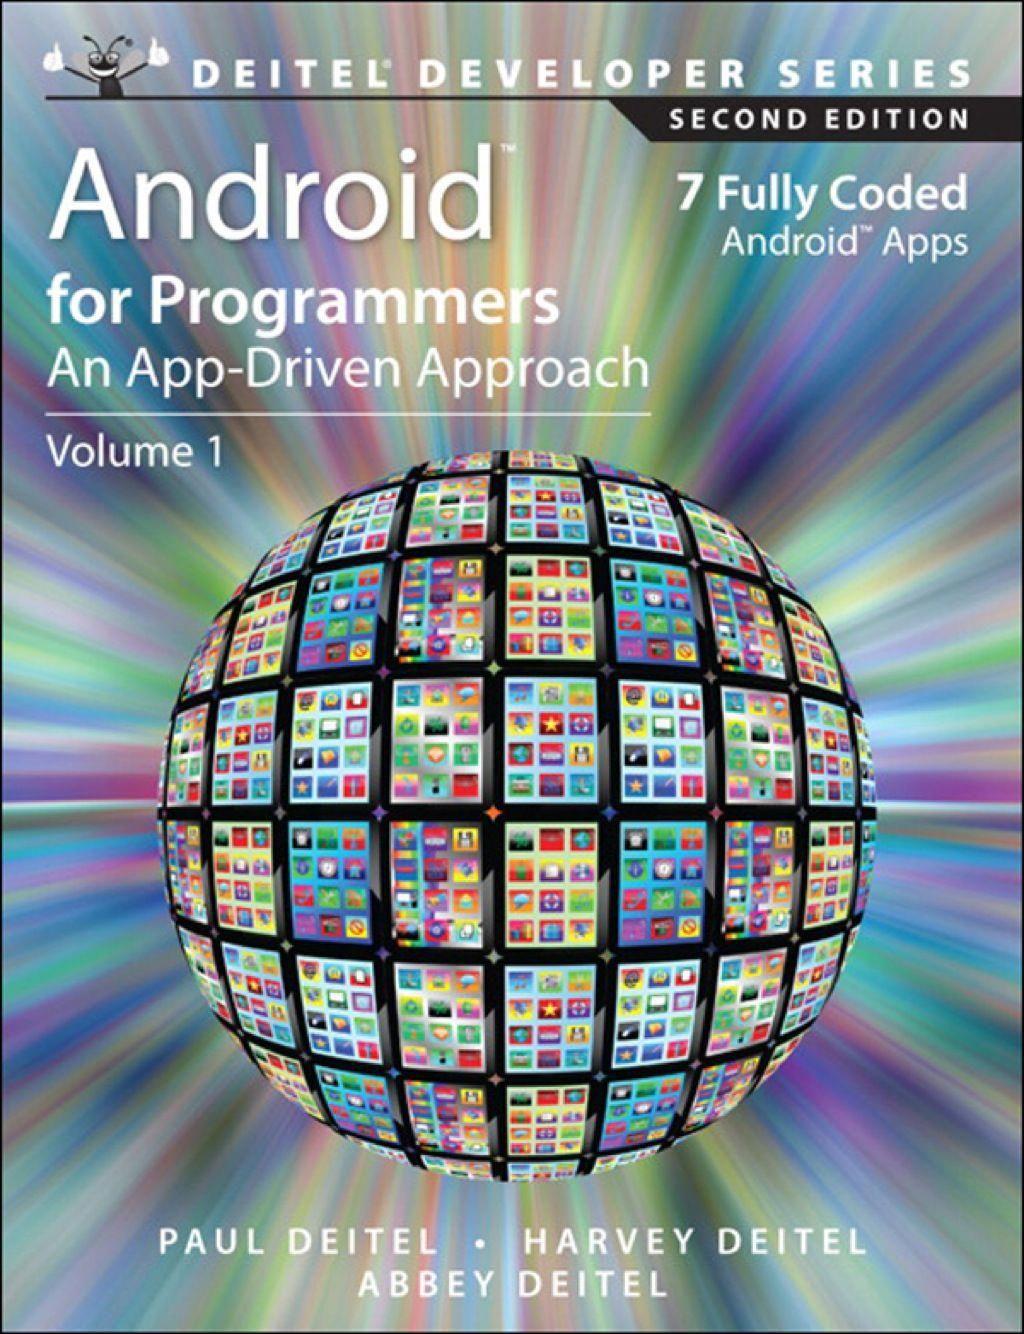 android art Android in 2020 Android art, Android